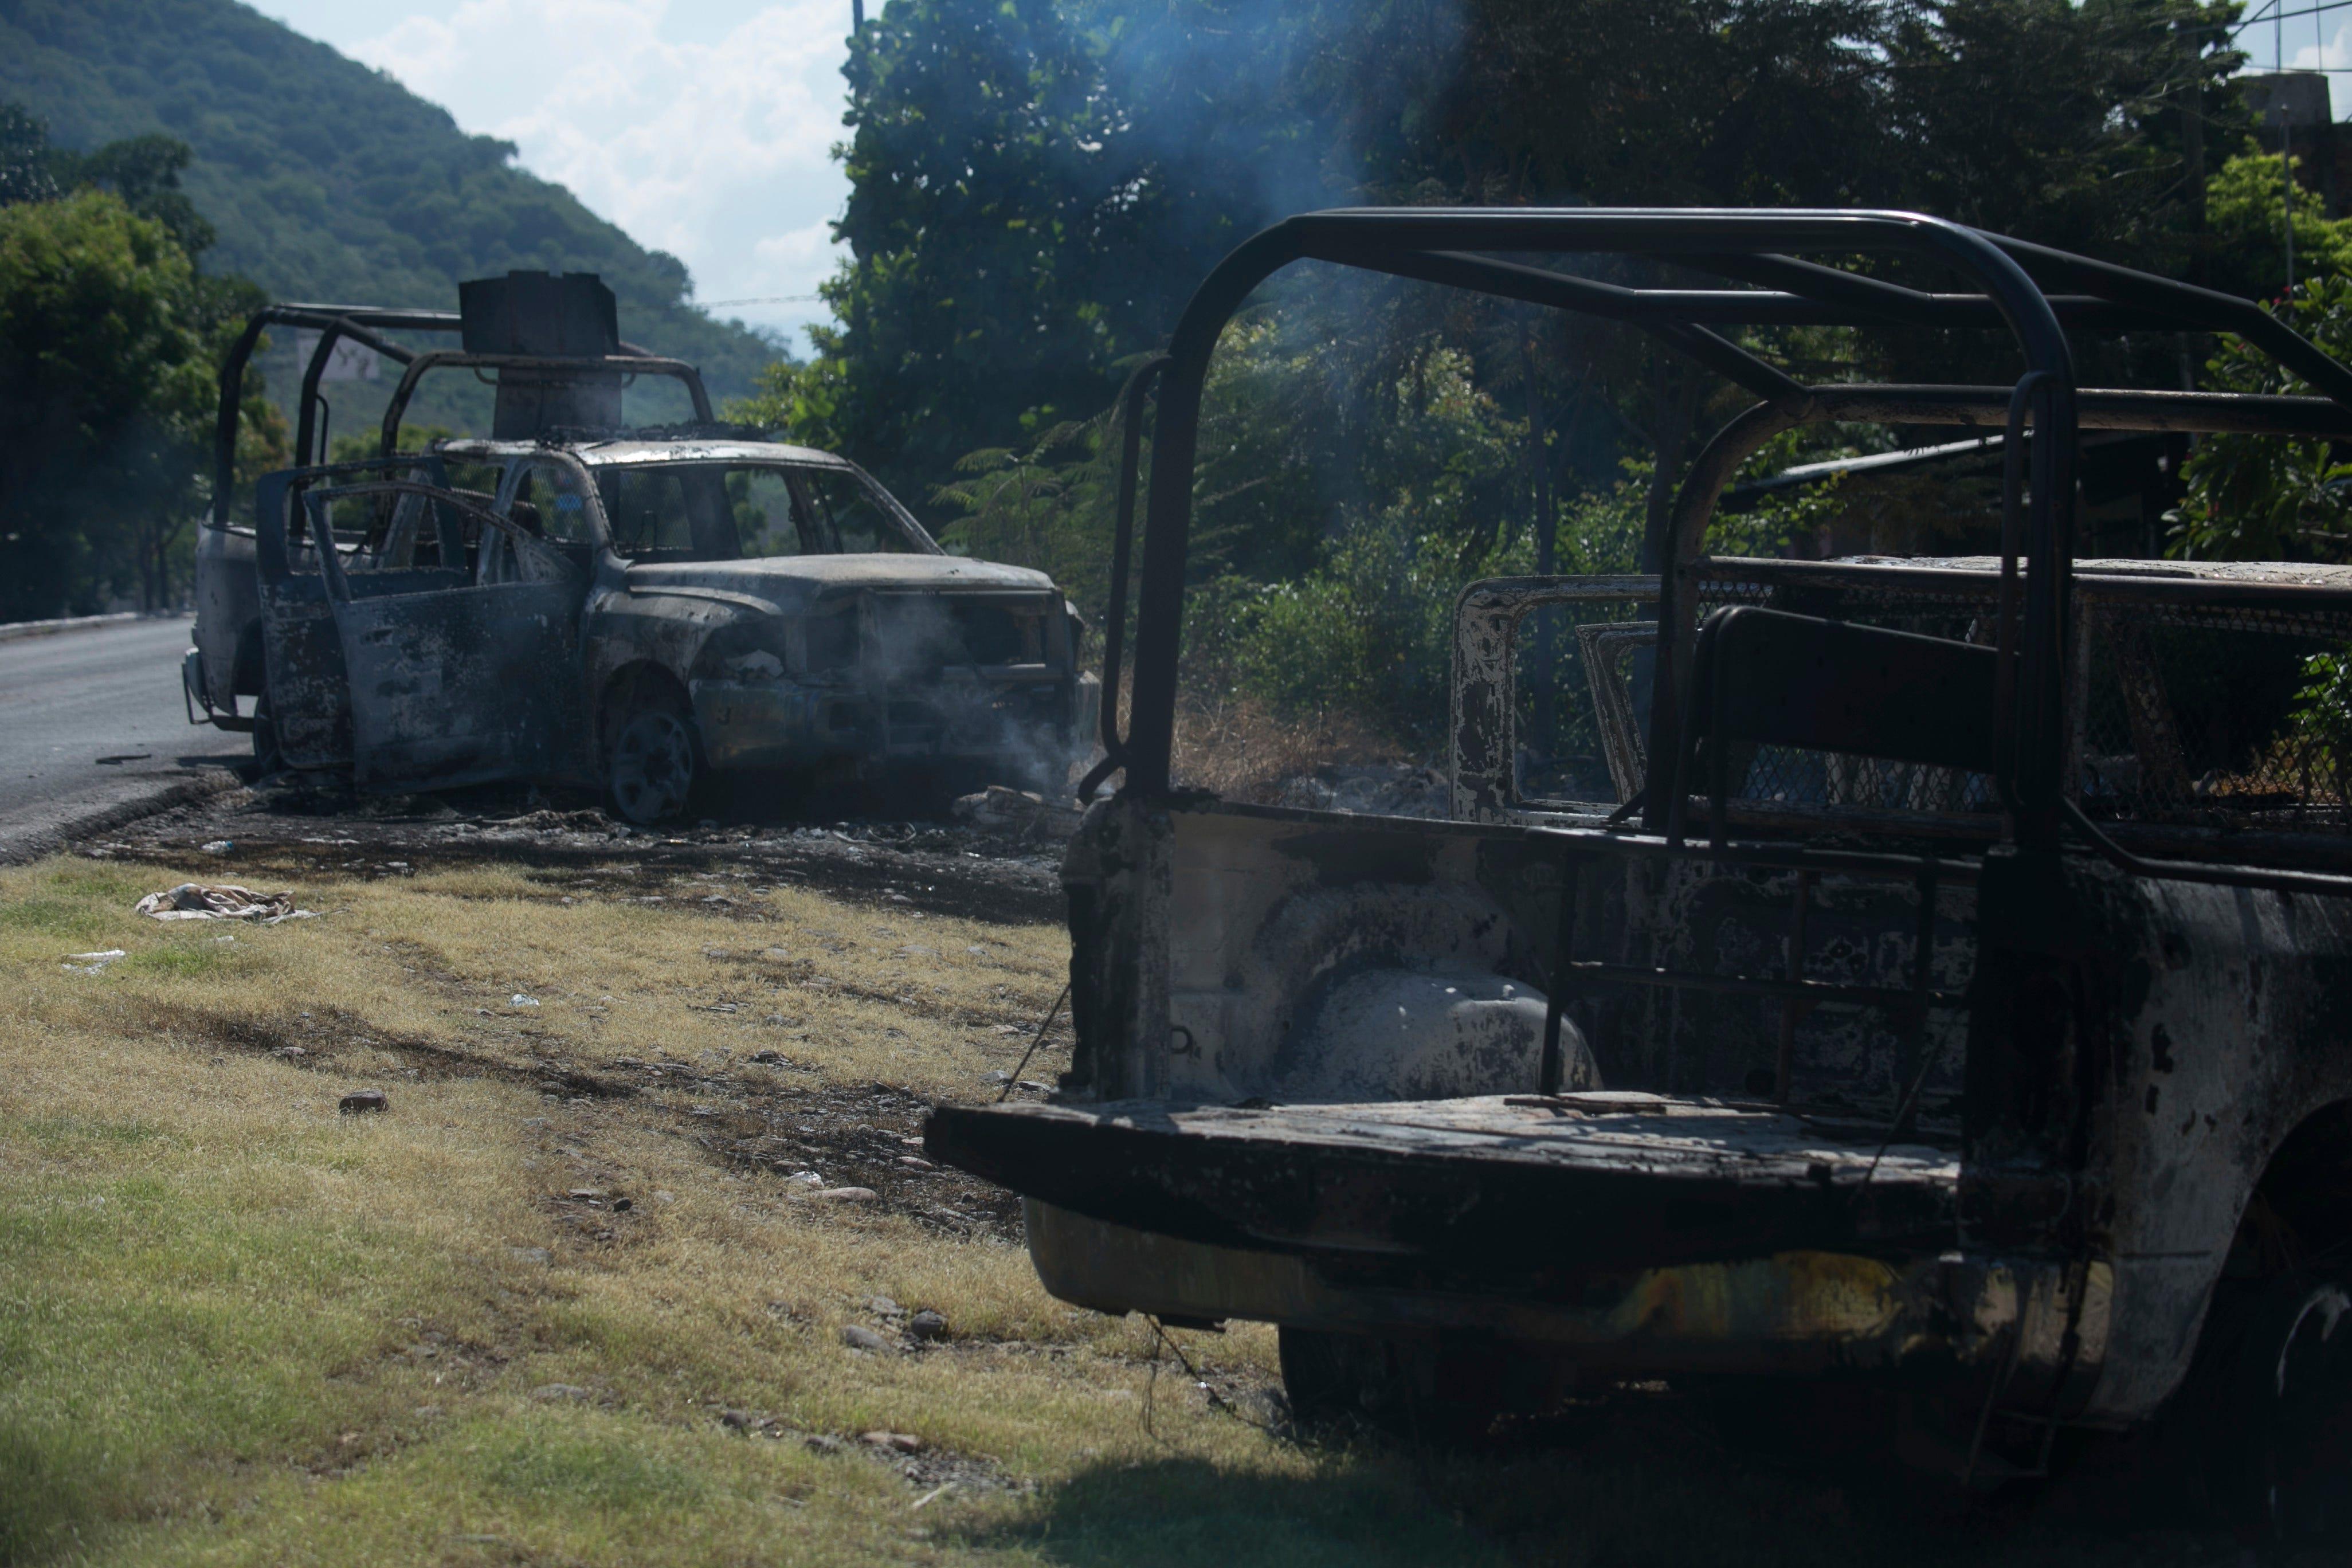 Aguililla Michoacan 13 Officers Killed In Ambush Of Mexico Police